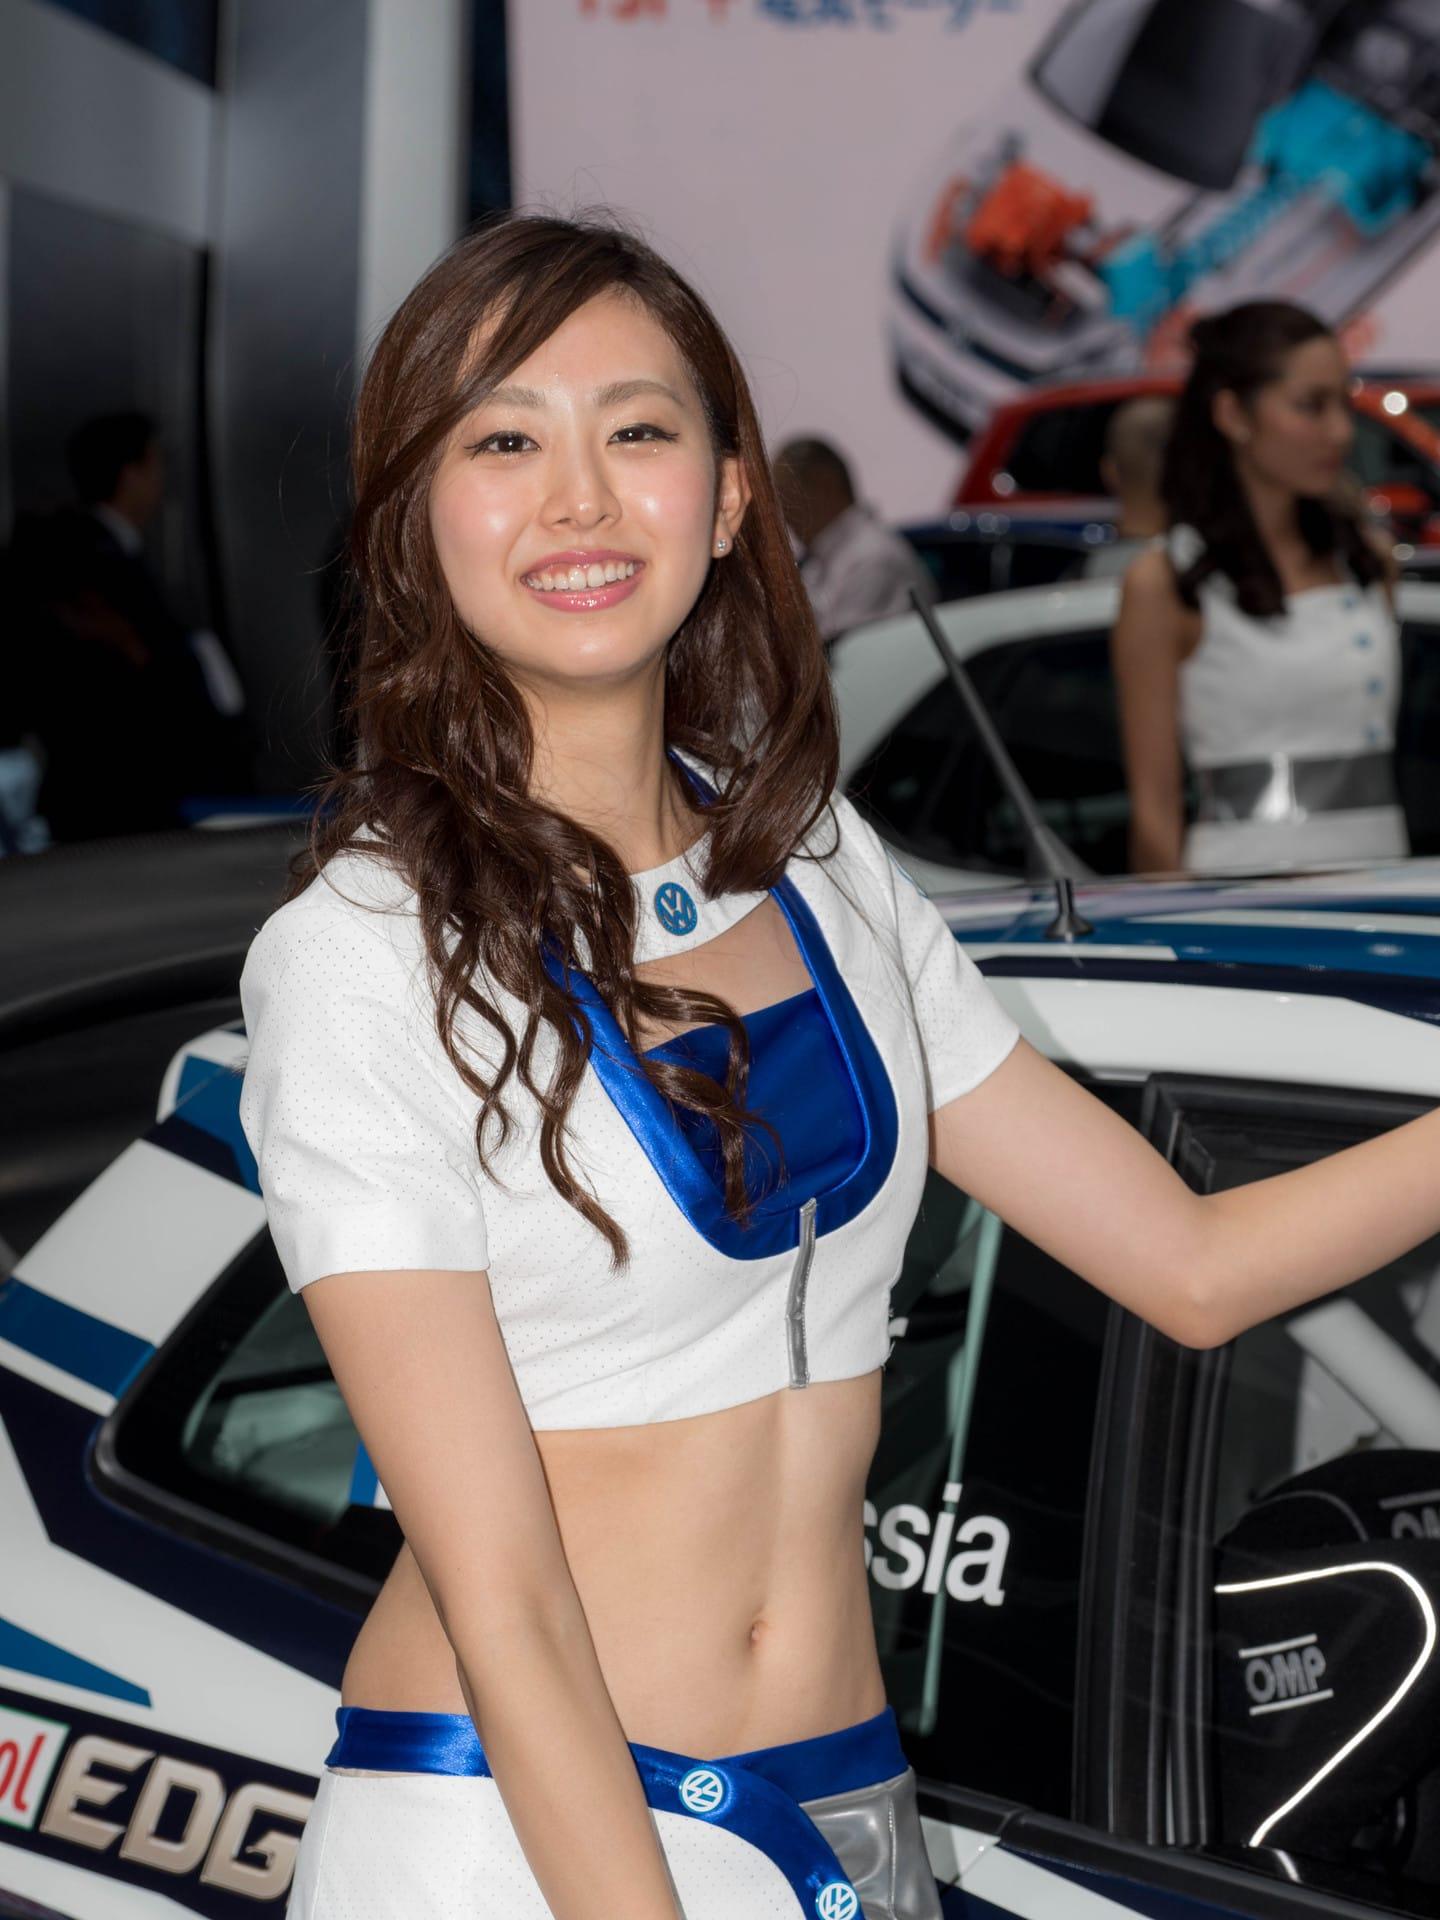 Tokyo Motor Show 2015 古城優奈さん Vol 2 (無断掲載、無断2次利用禁止です